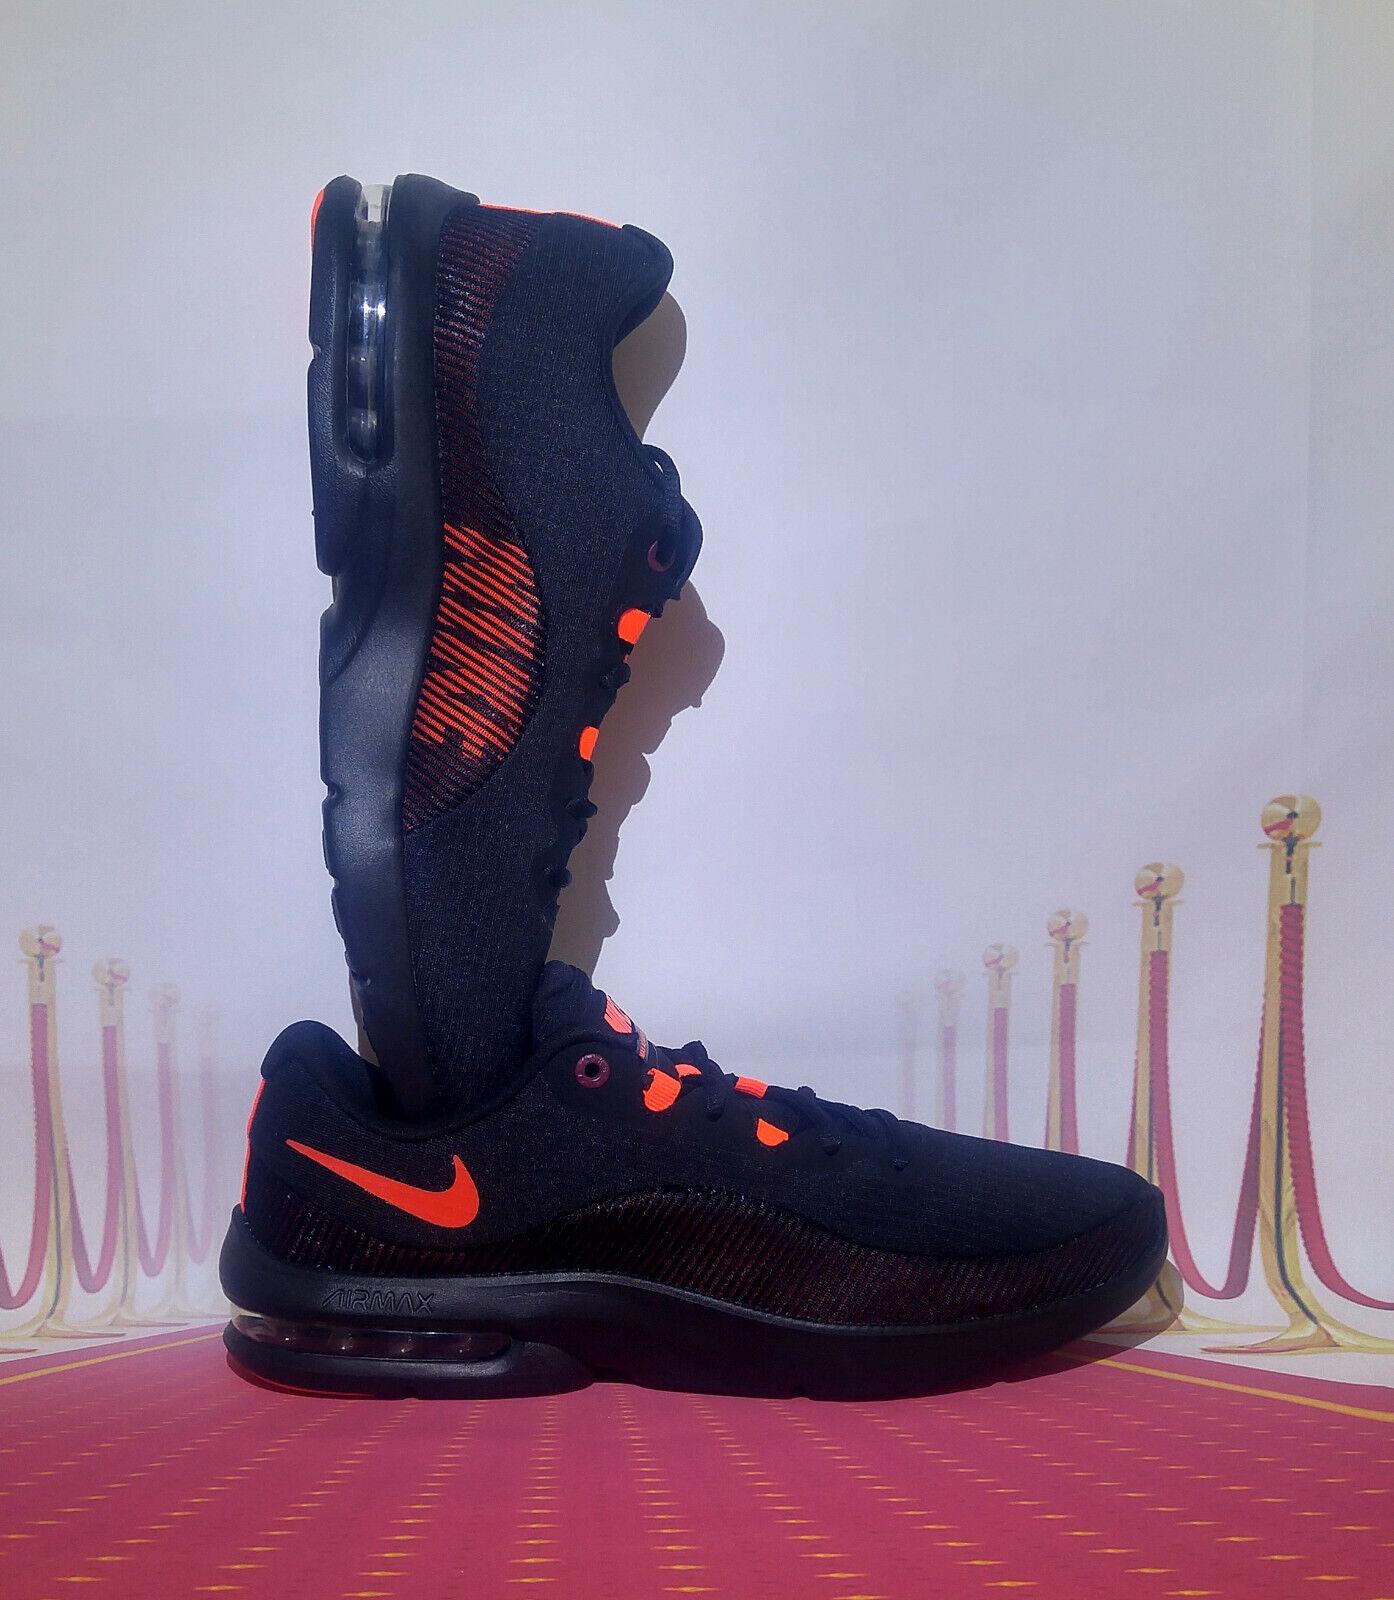 Nike Air Max Advantage 2 AA7396-004 Men's shoes Size 11 black orange NEW